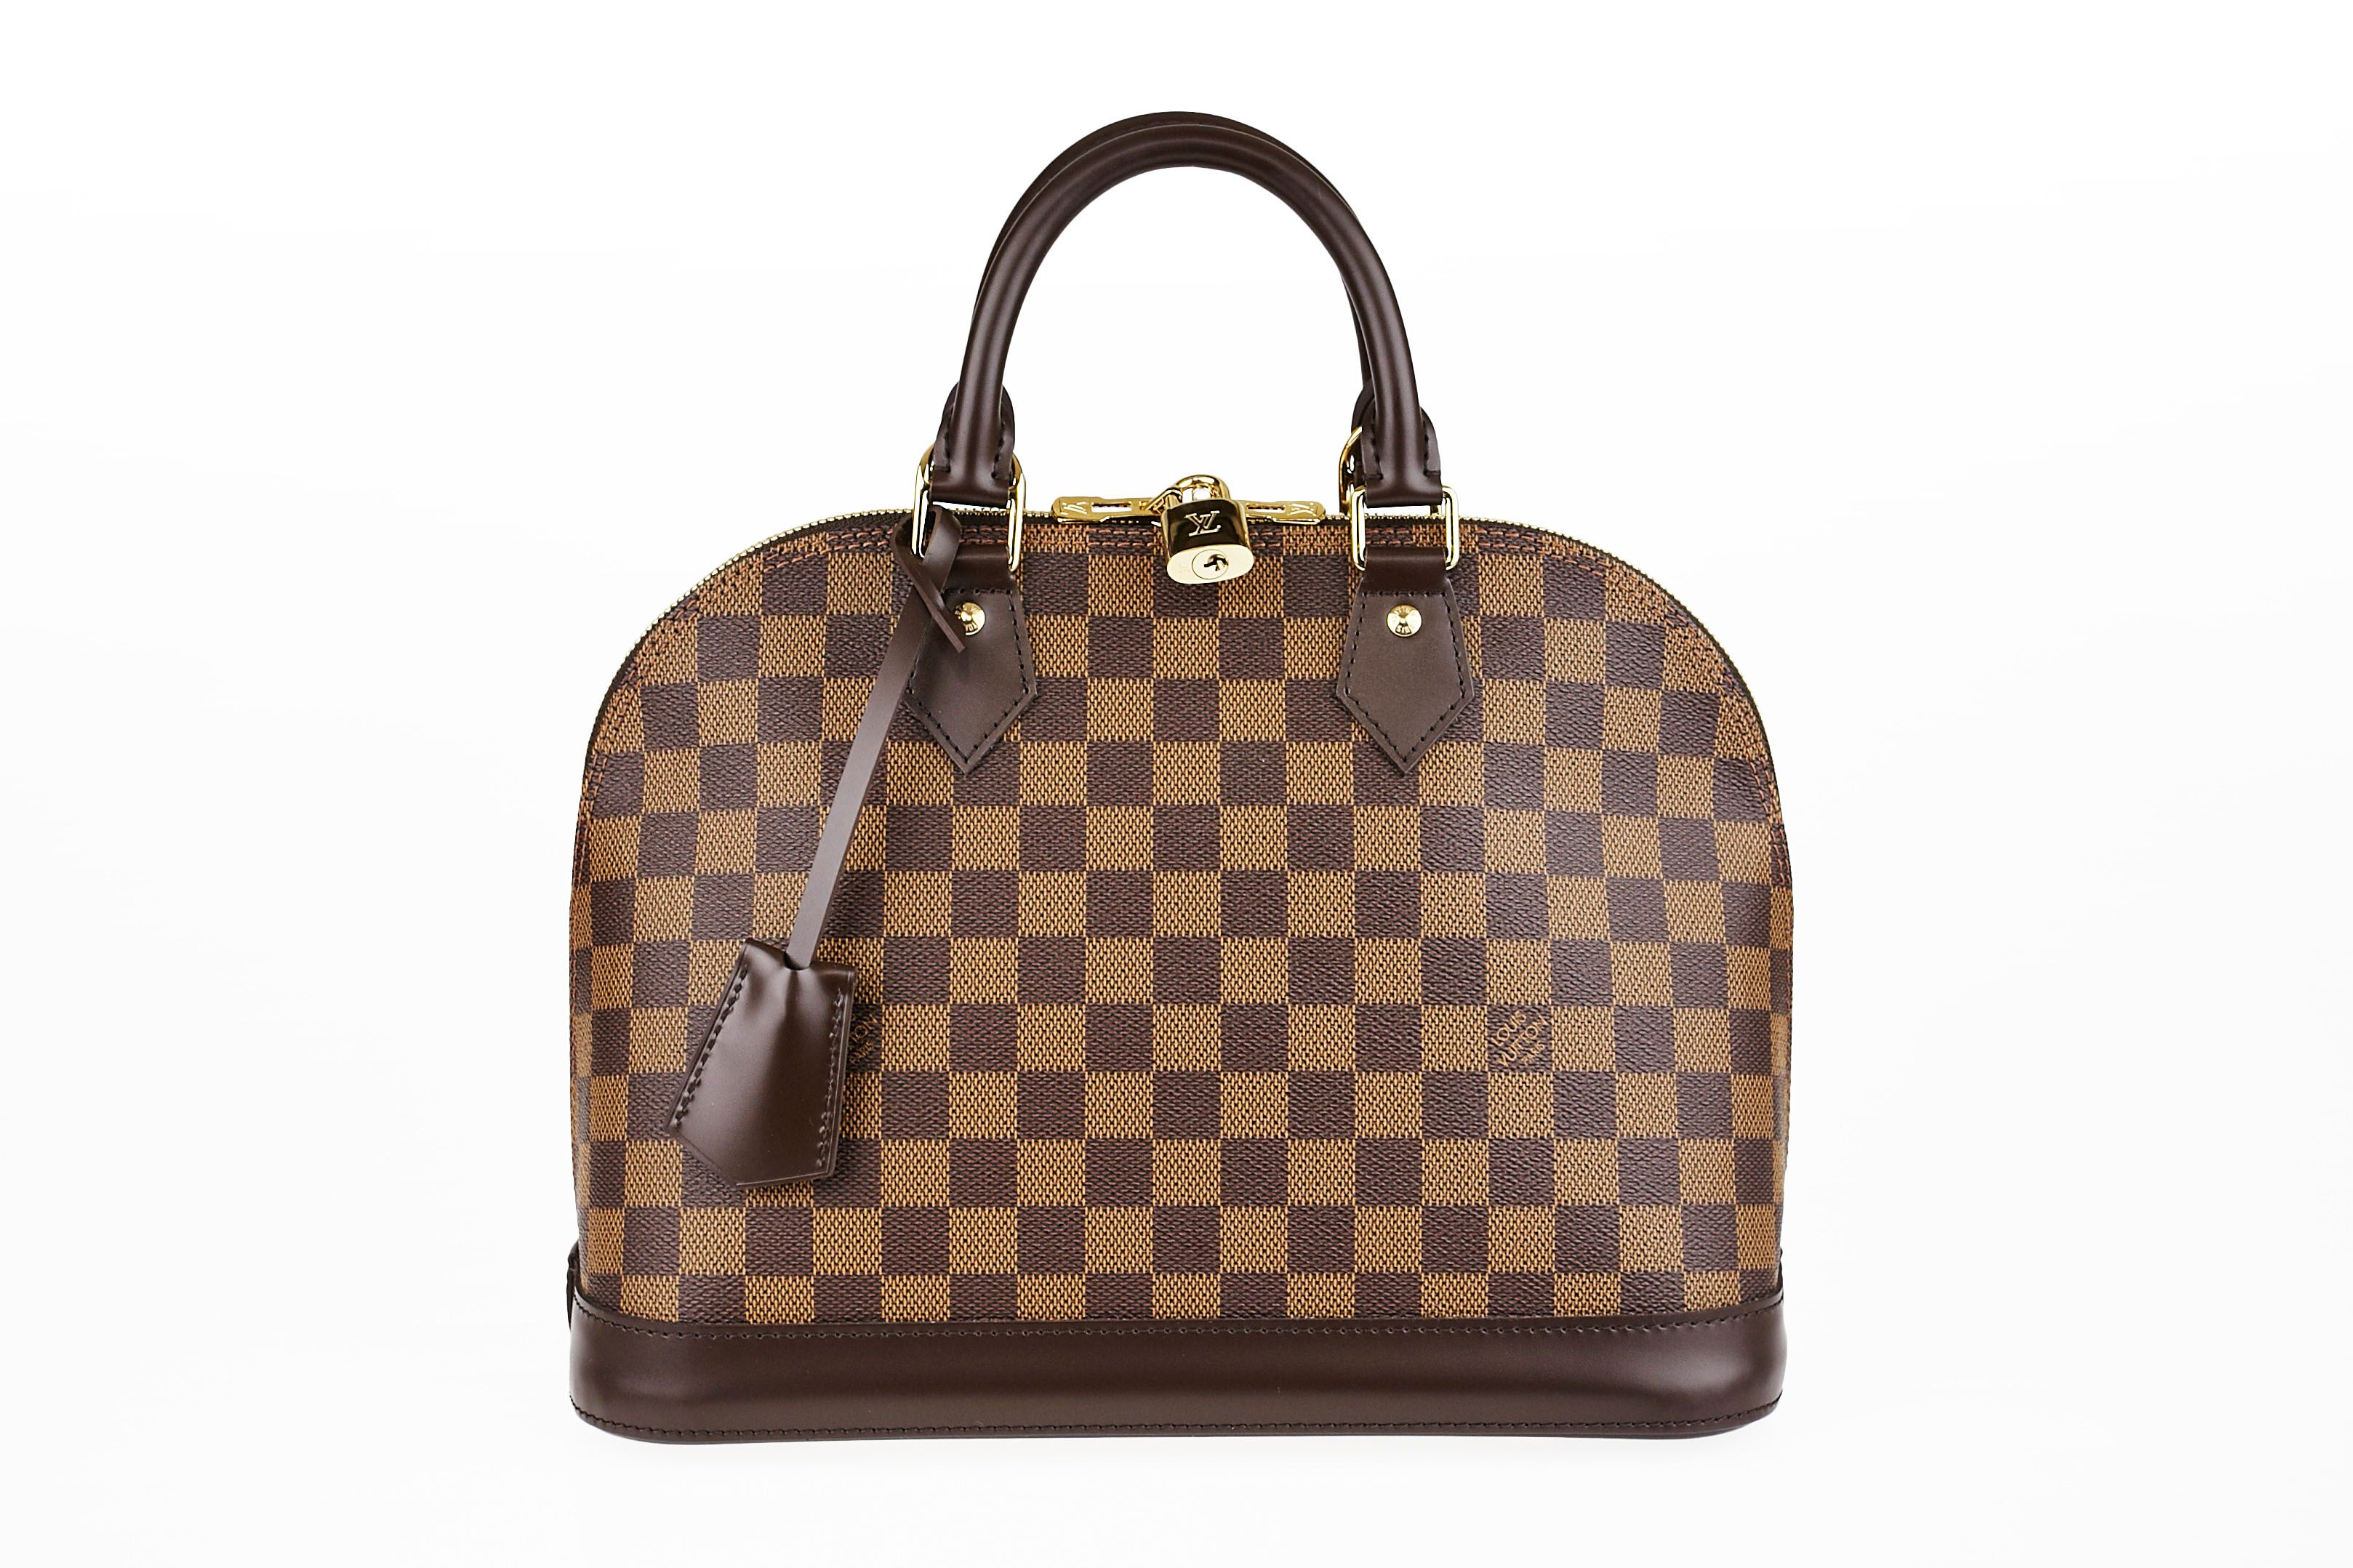 6d843cfbdac7 Win this Louis Vuitton Damier Canvas Alma PM Bag - Yoogi s Closet ...